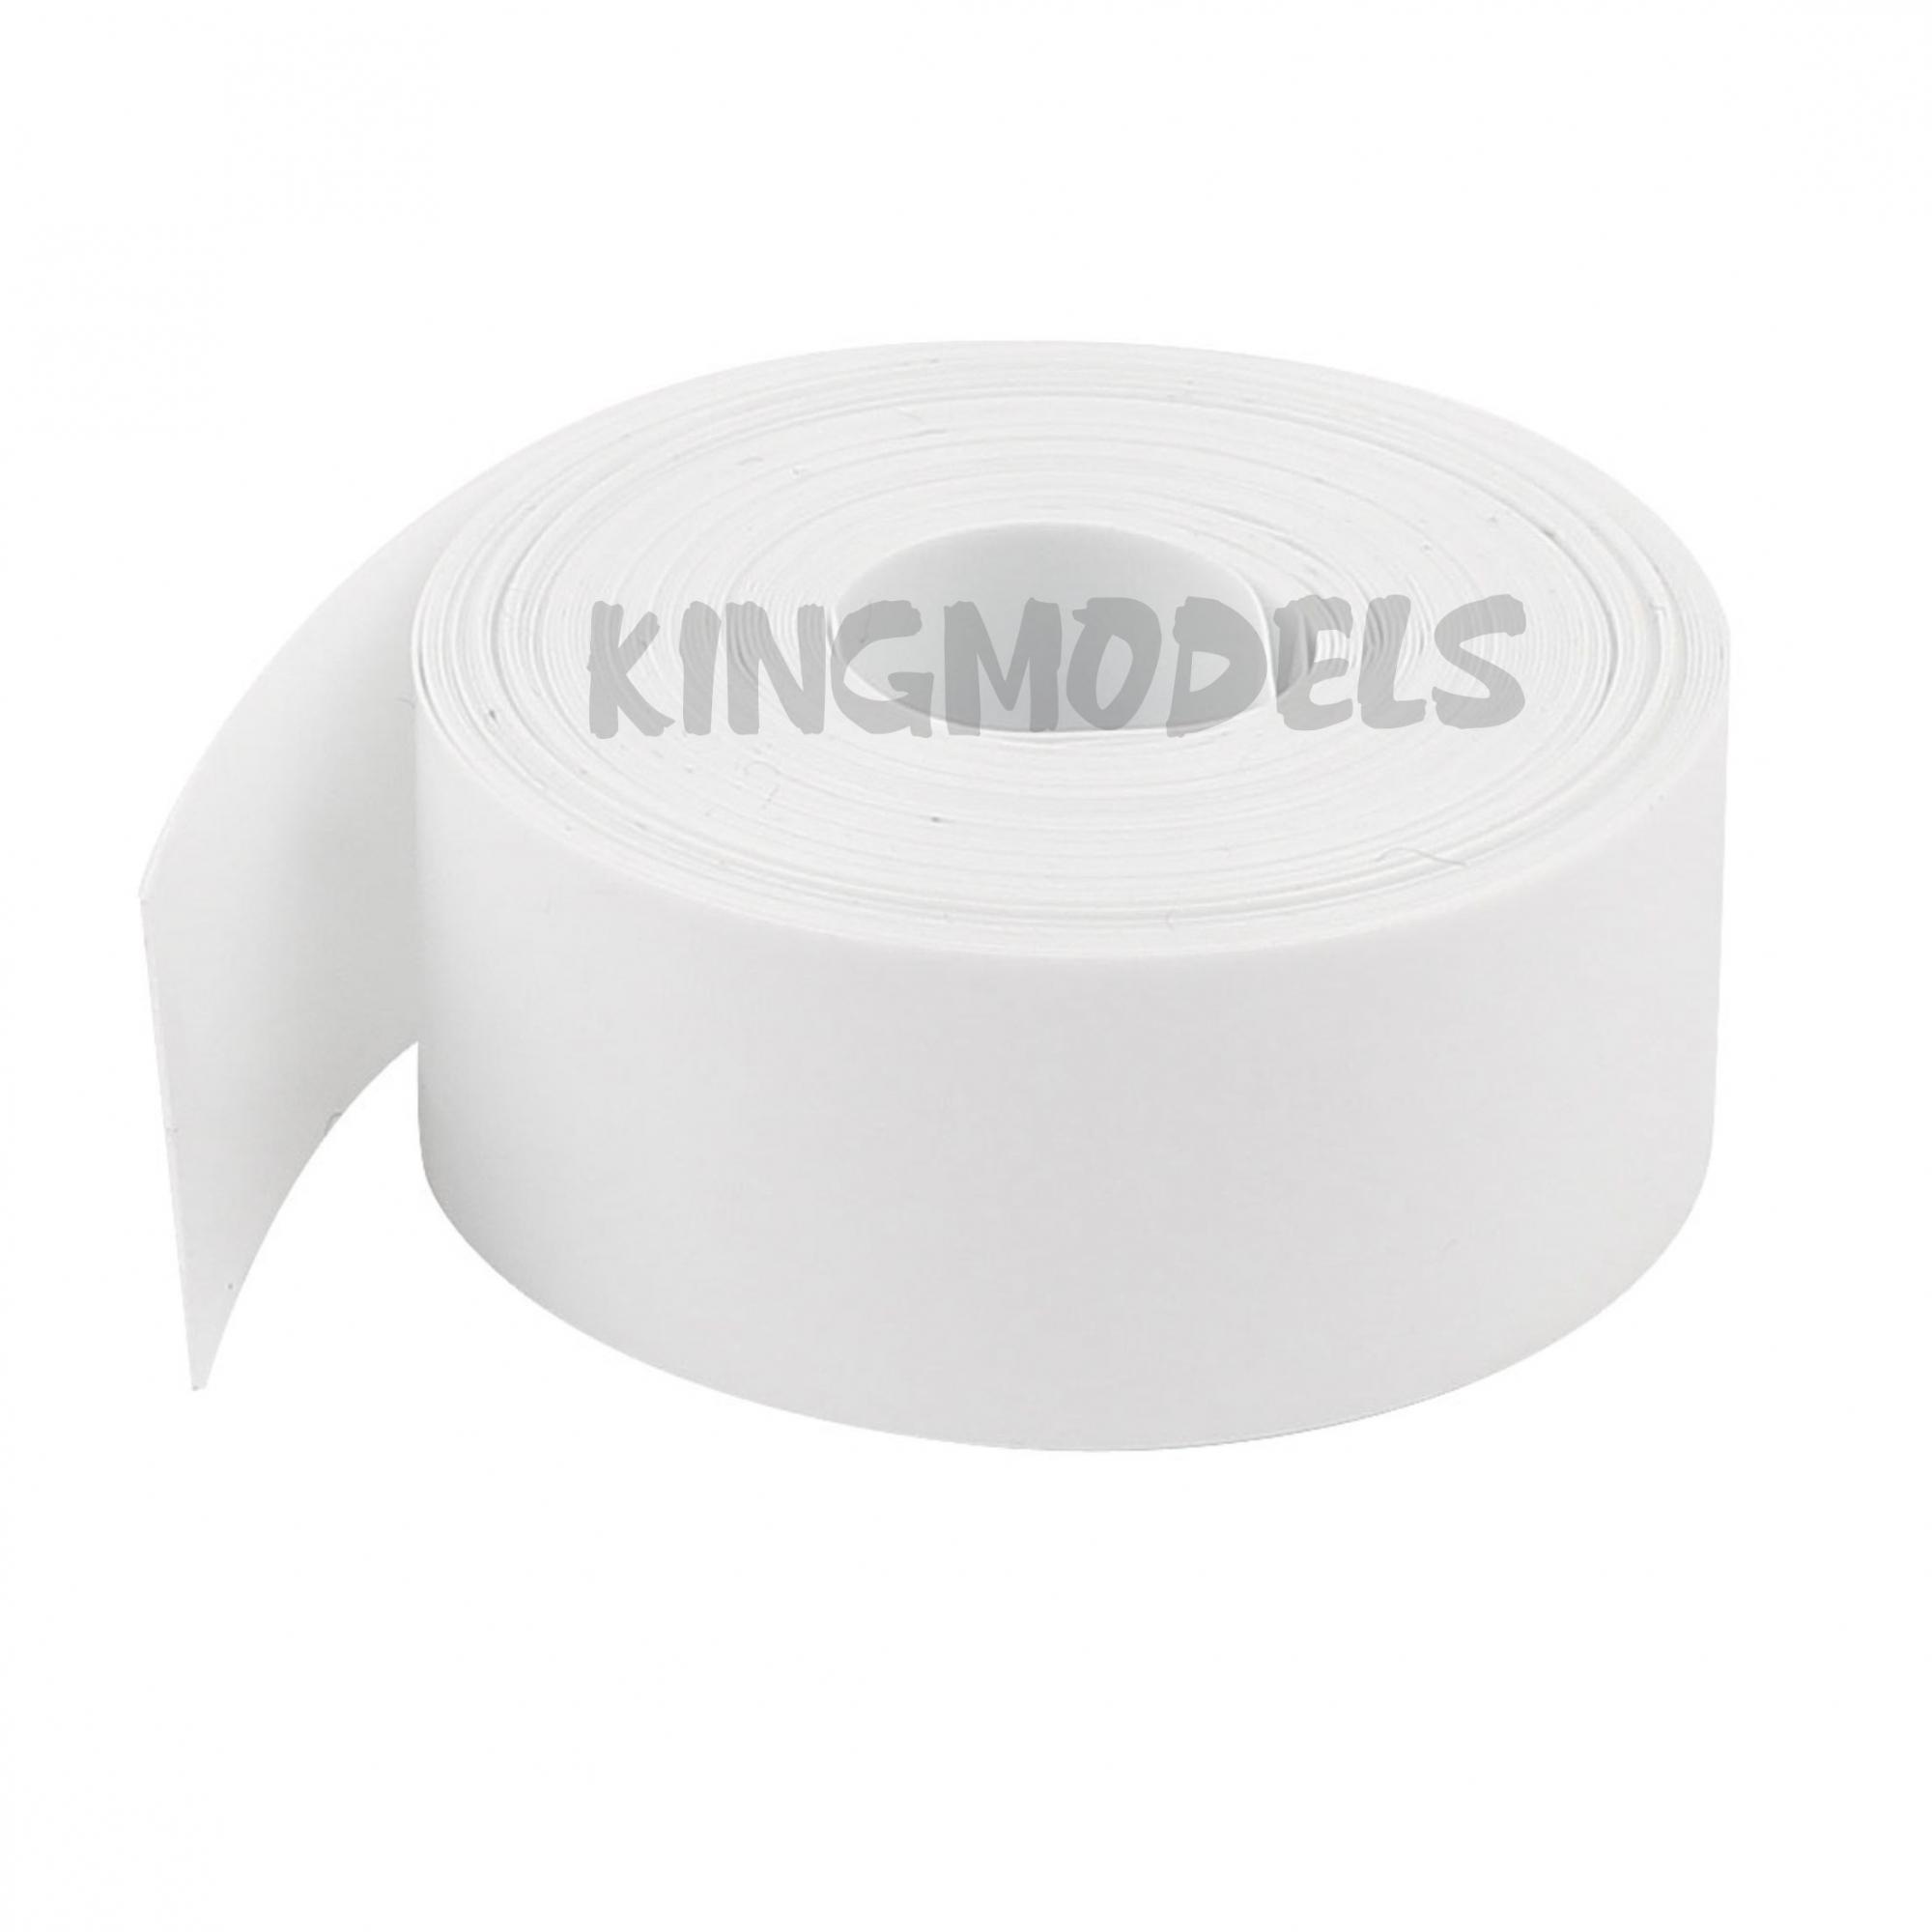 1xmt Tubo Termo retrátil Branco Pvc 150mm chato / diam. 95.4mm  - King Models